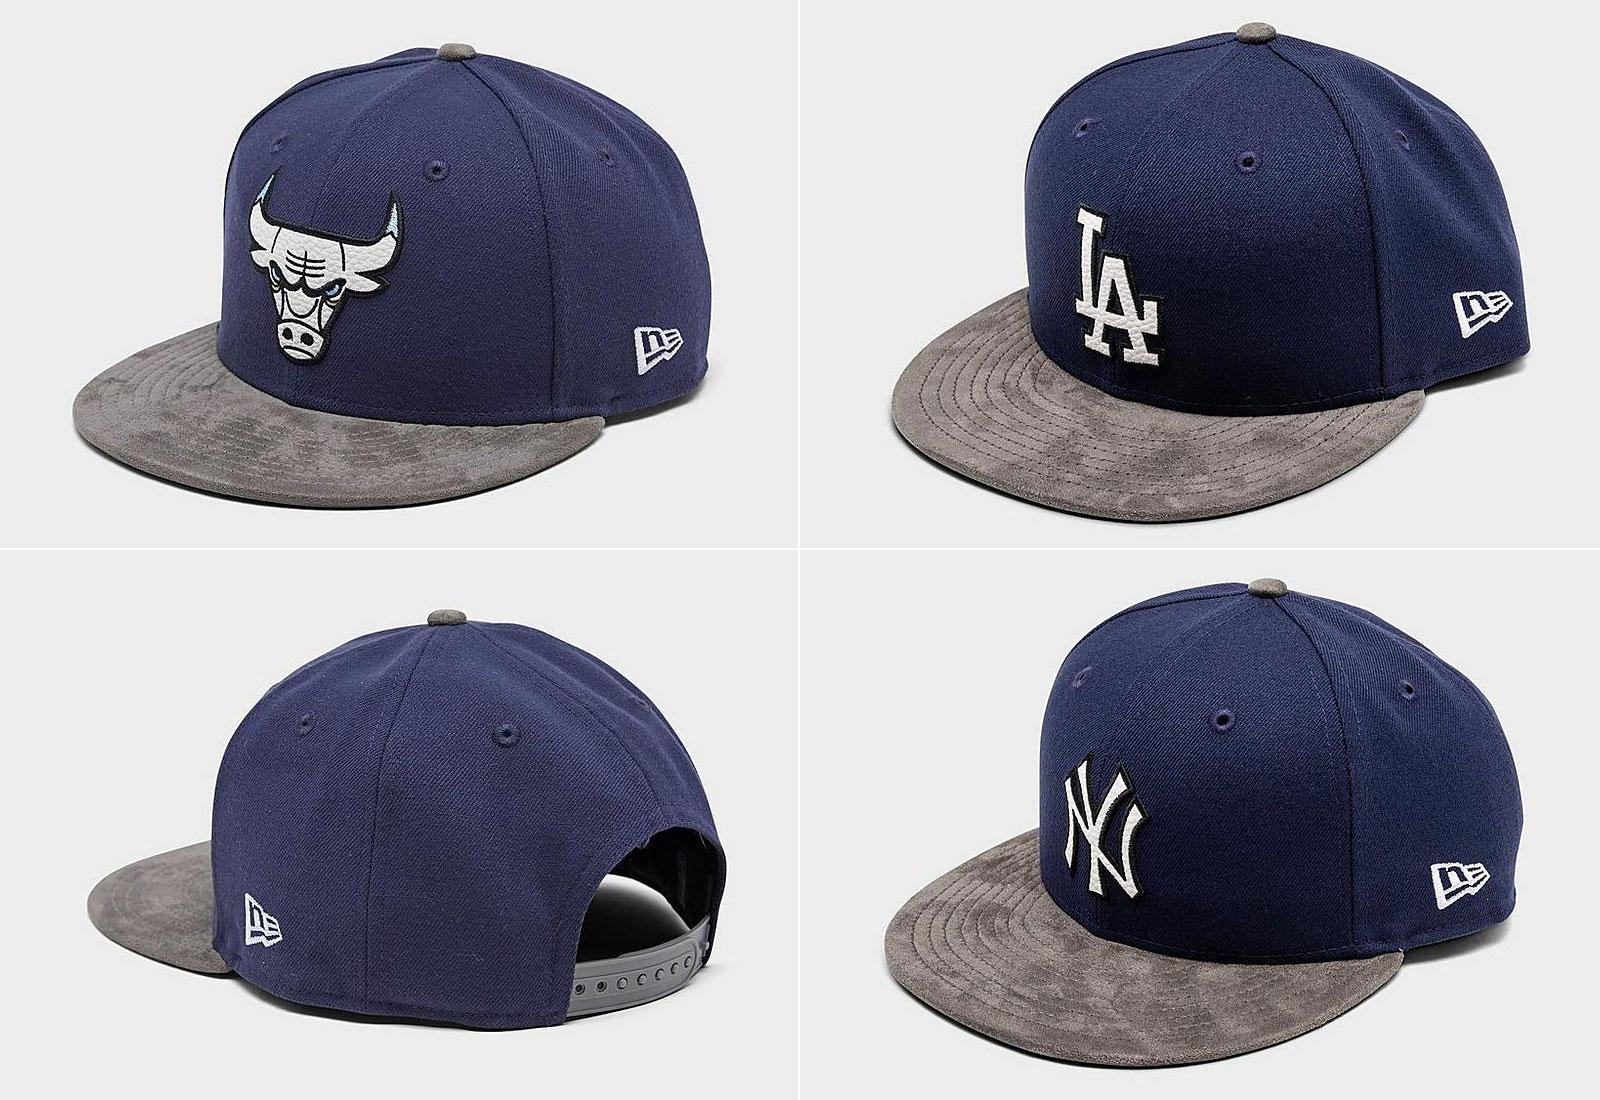 flint-13-new-era-nba-snapback-hats